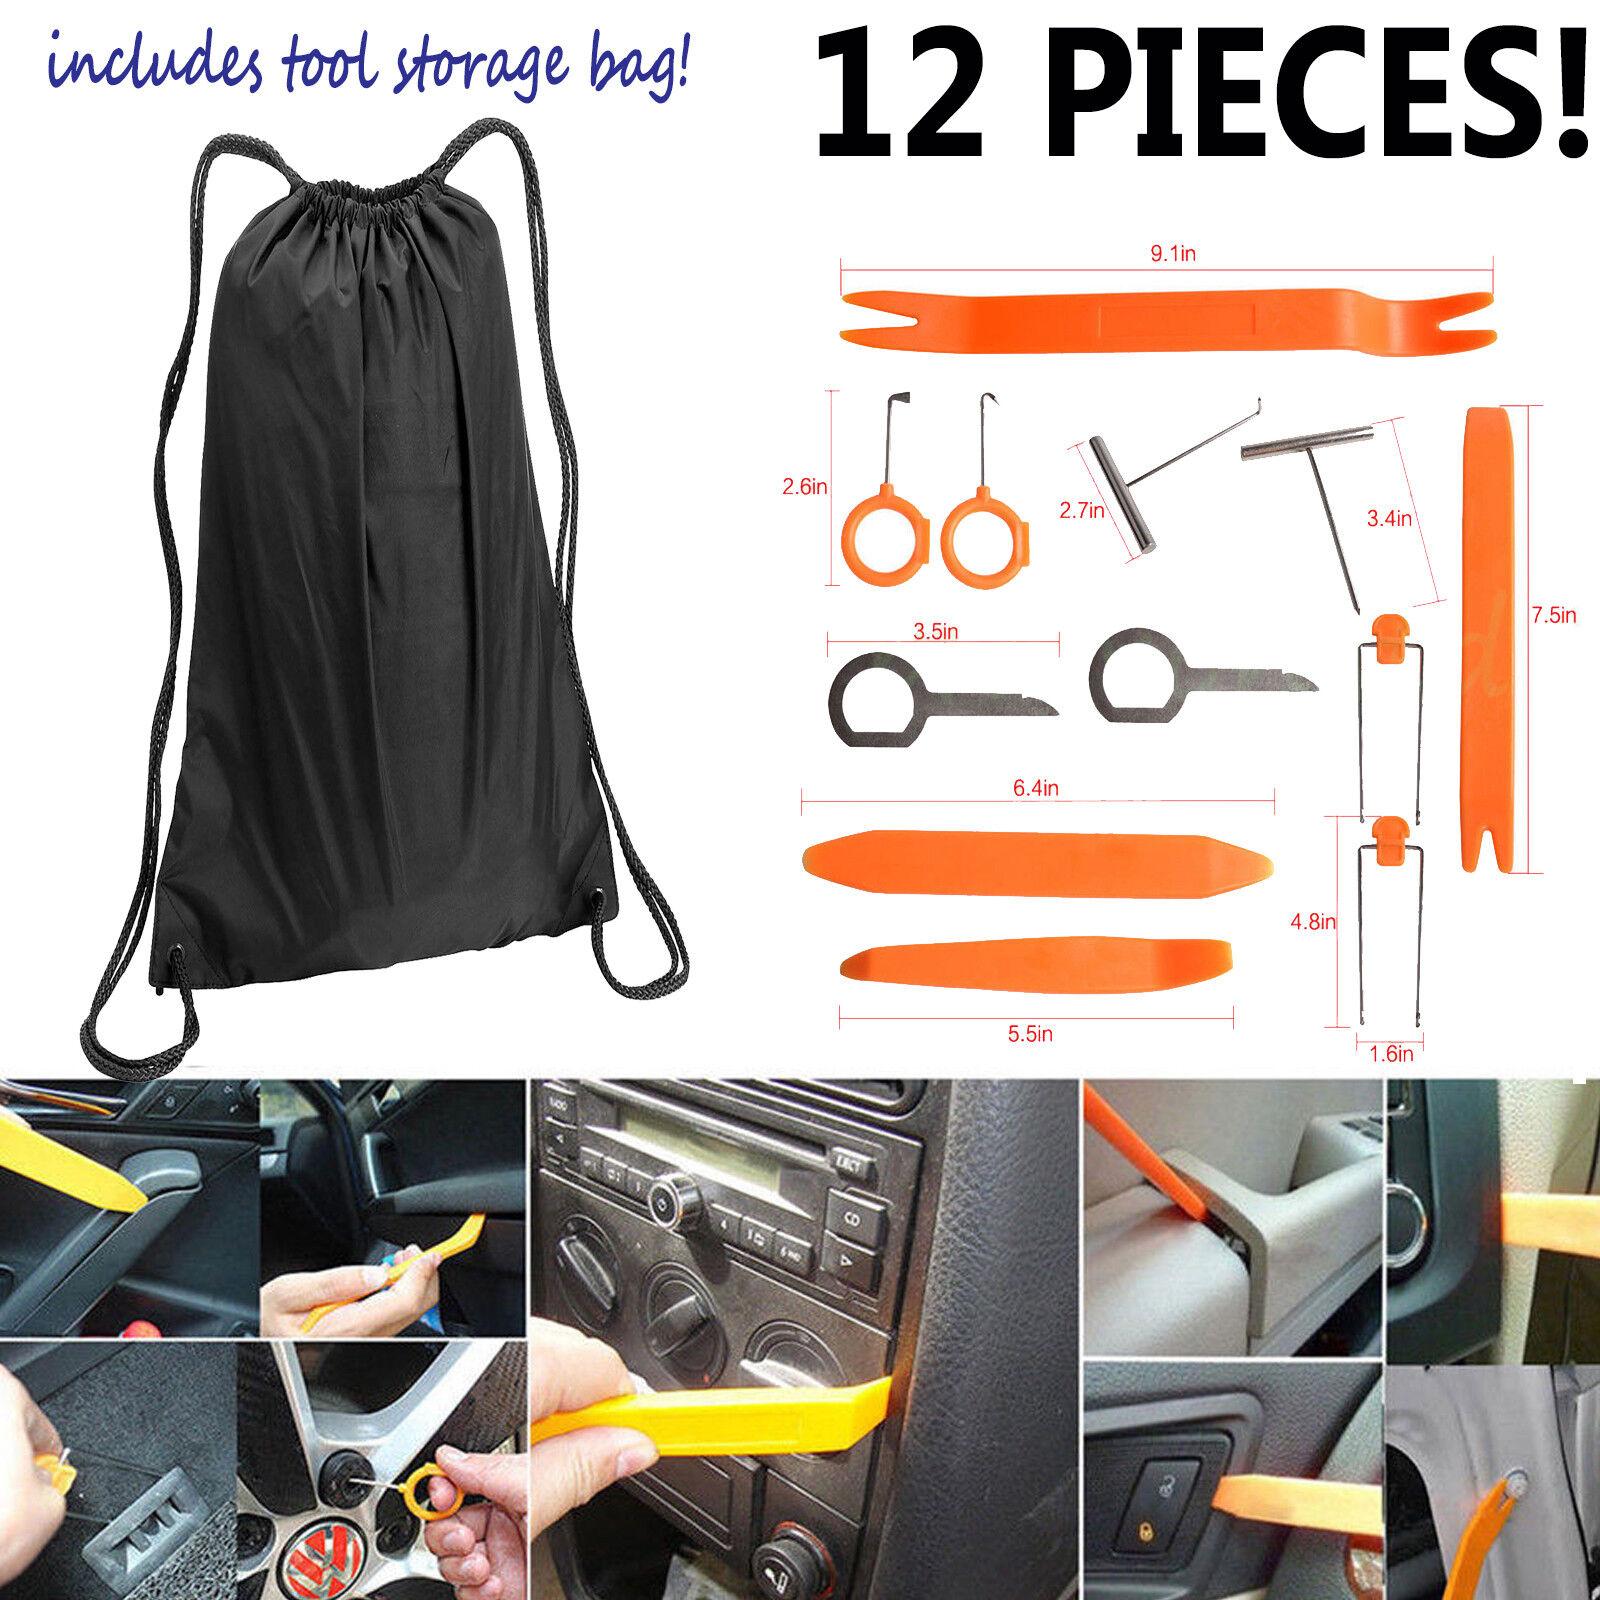 Universal Pry Removal Open Tools Kit Car Dash Door Trim Panel Clip Radio/Lights Automotive Tools & Supplies